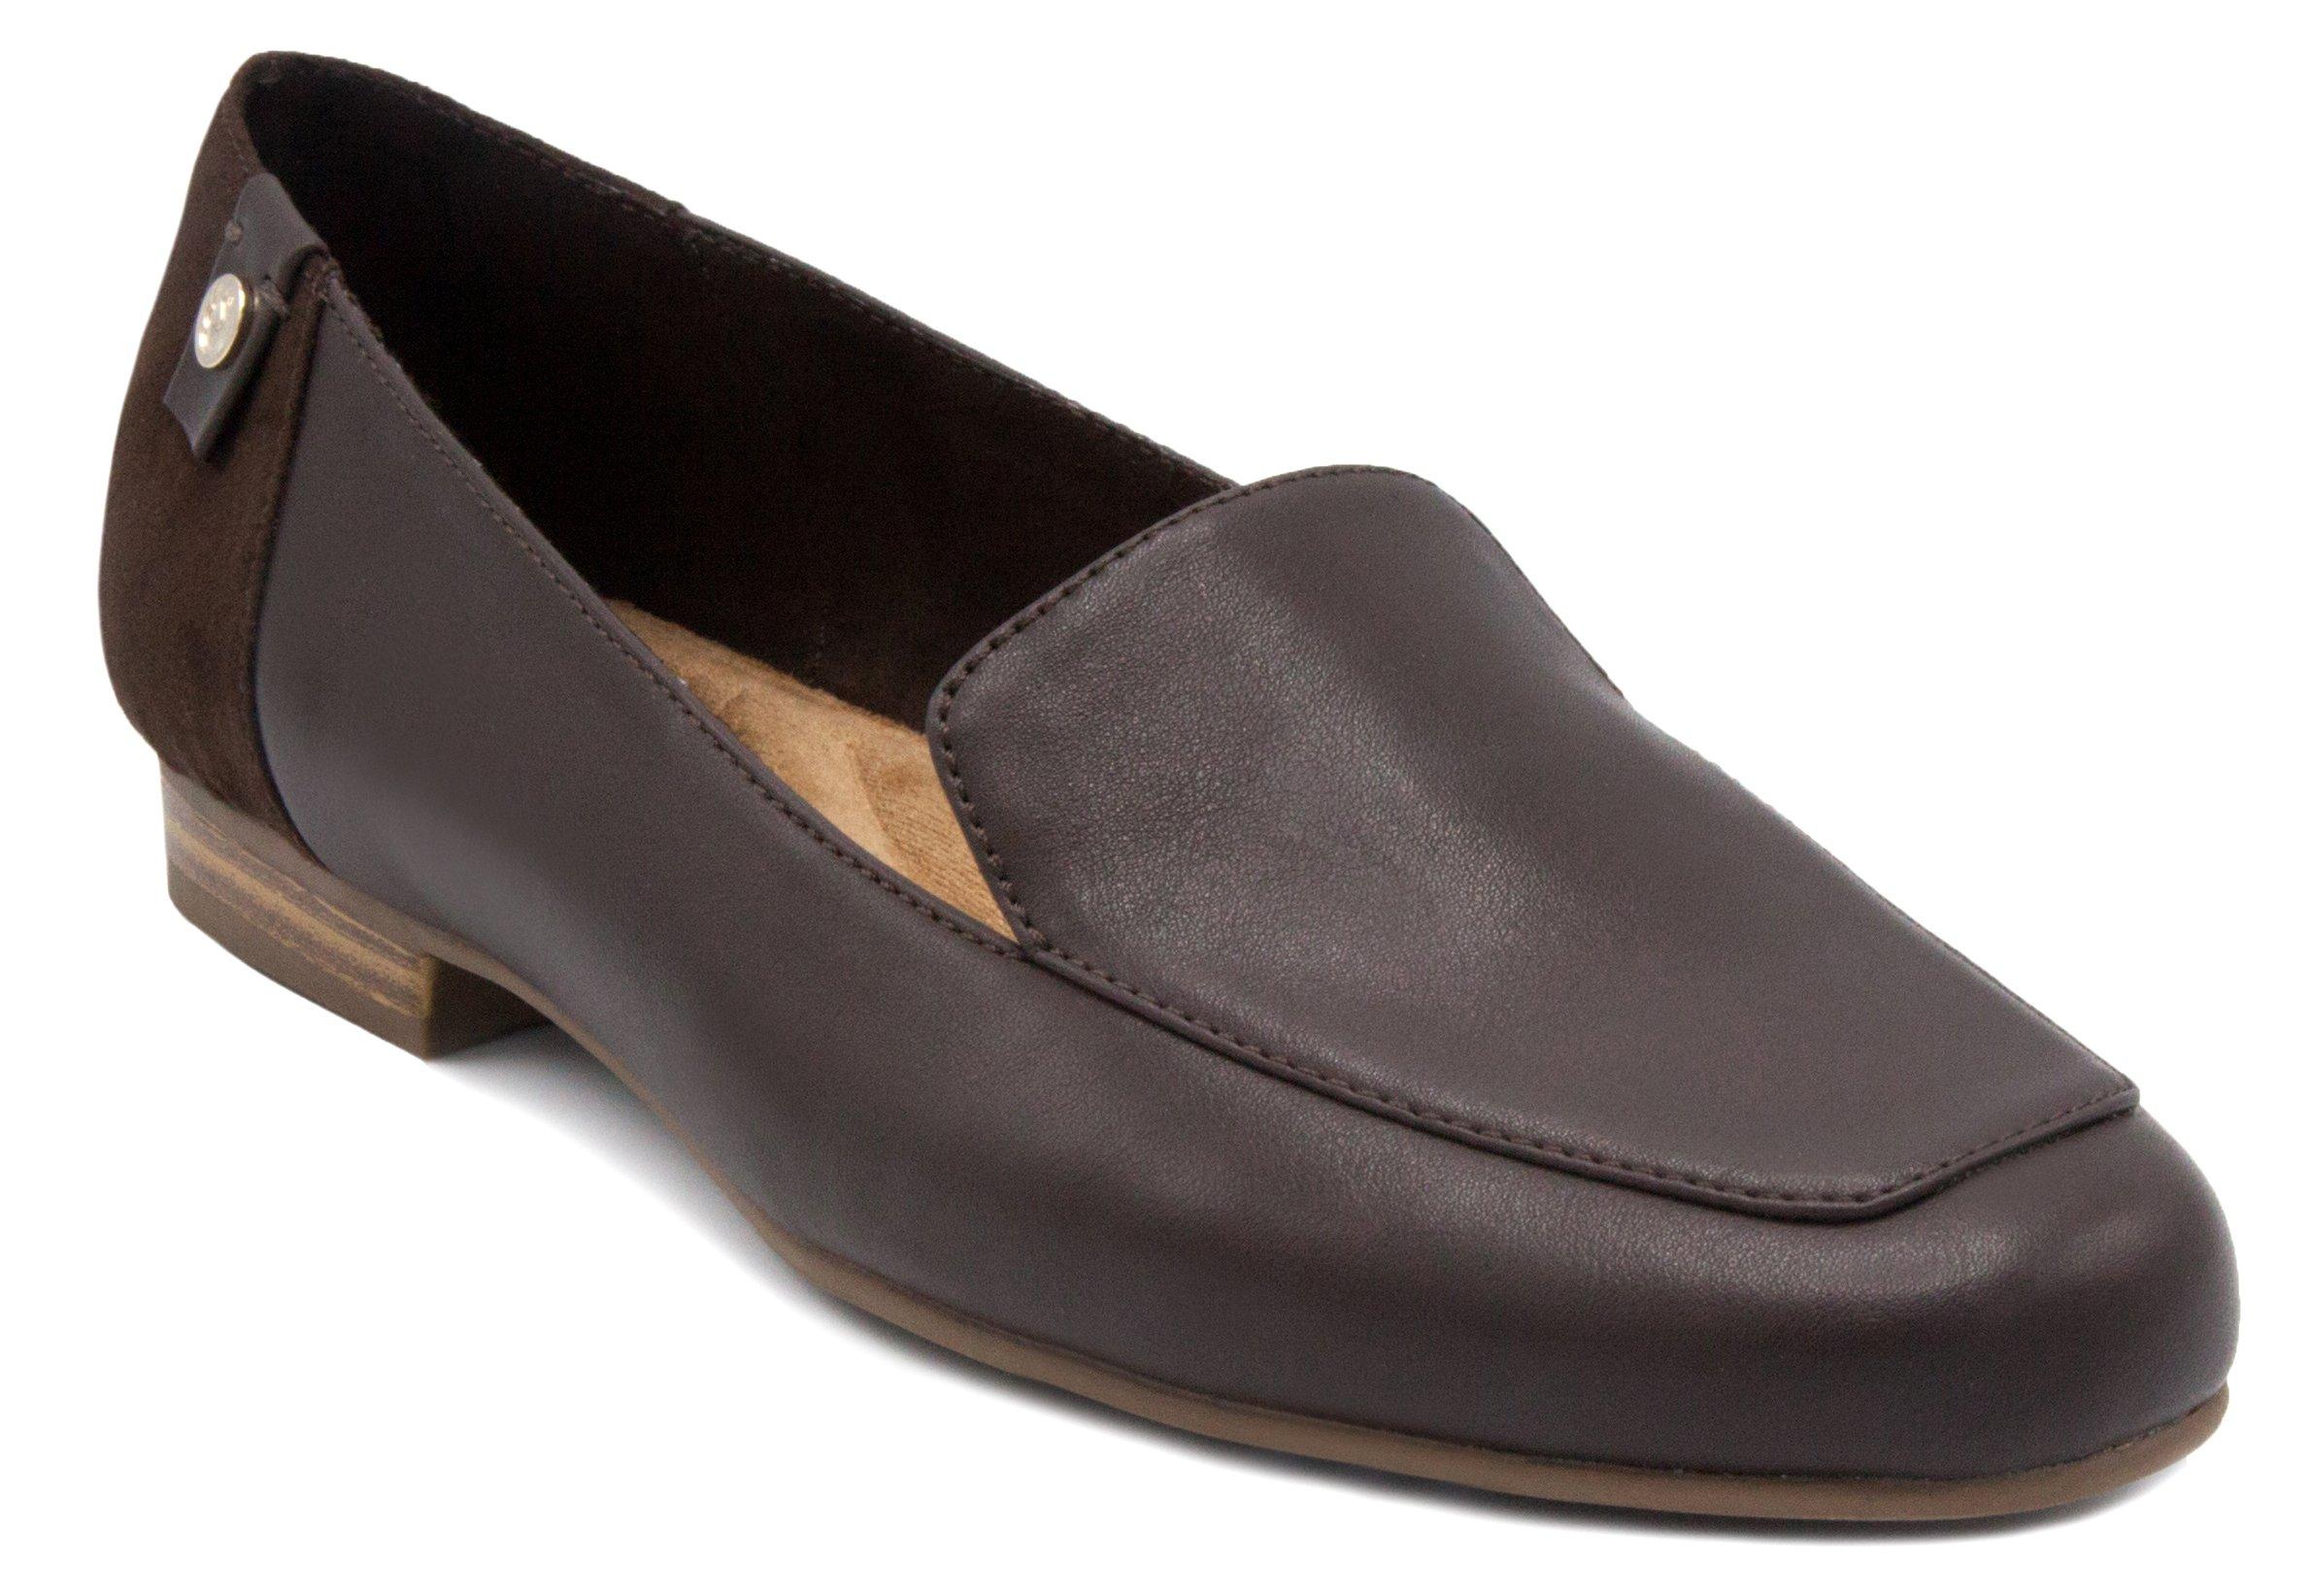 Gloria Vanderbilt Women's Marjorie Classic Slip On Slide Loafer Fashion Shoe Espresso Combo Tumbled 7.5